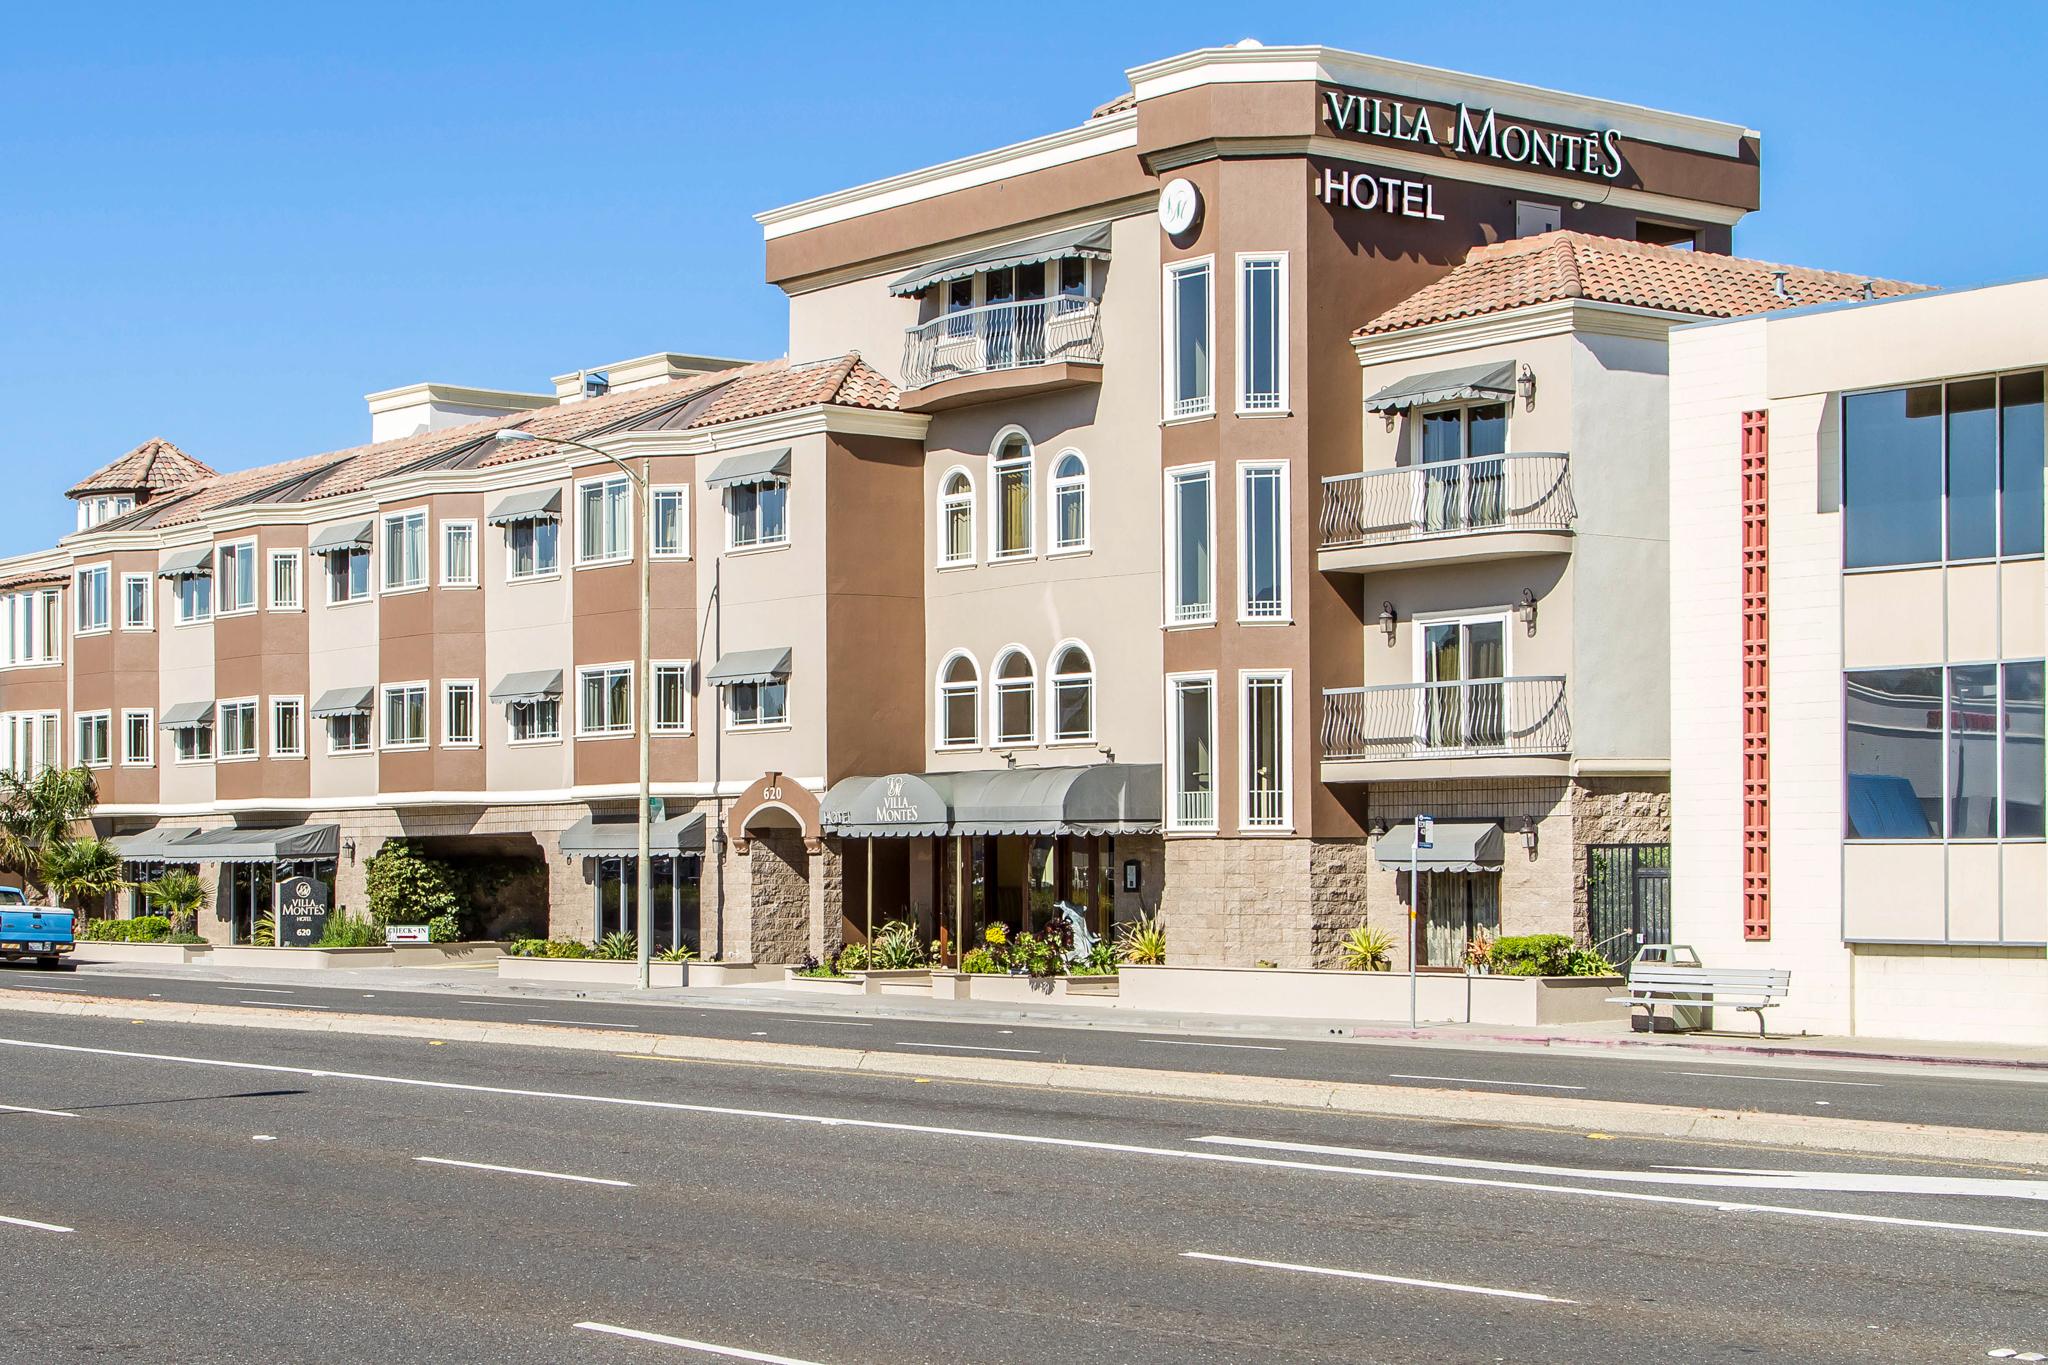 Villa montes hotel an ascend hotel collection member in for Villas san bruno